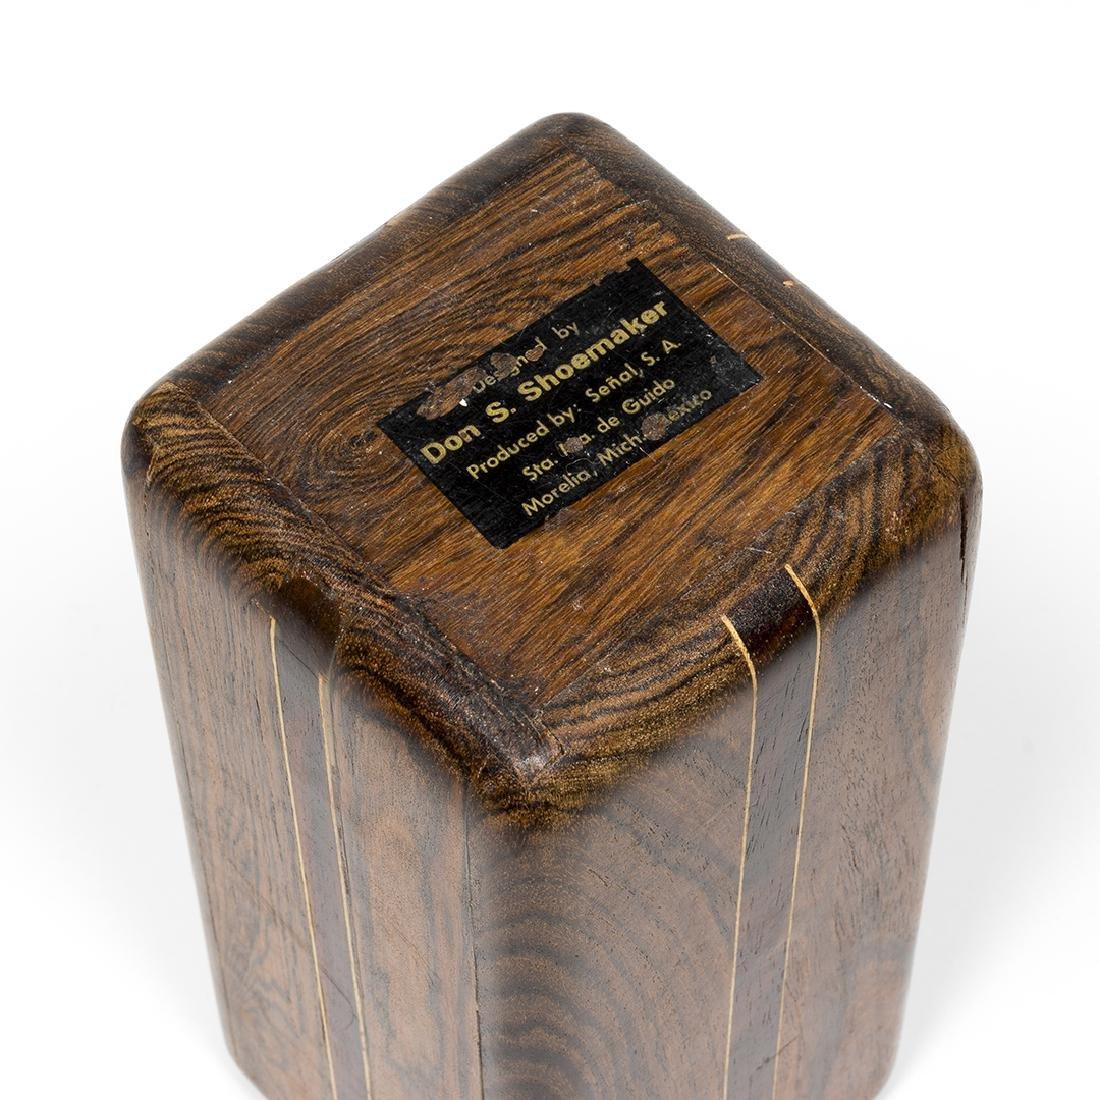 Don Shoemaker Lidded Boxes (2) - 5